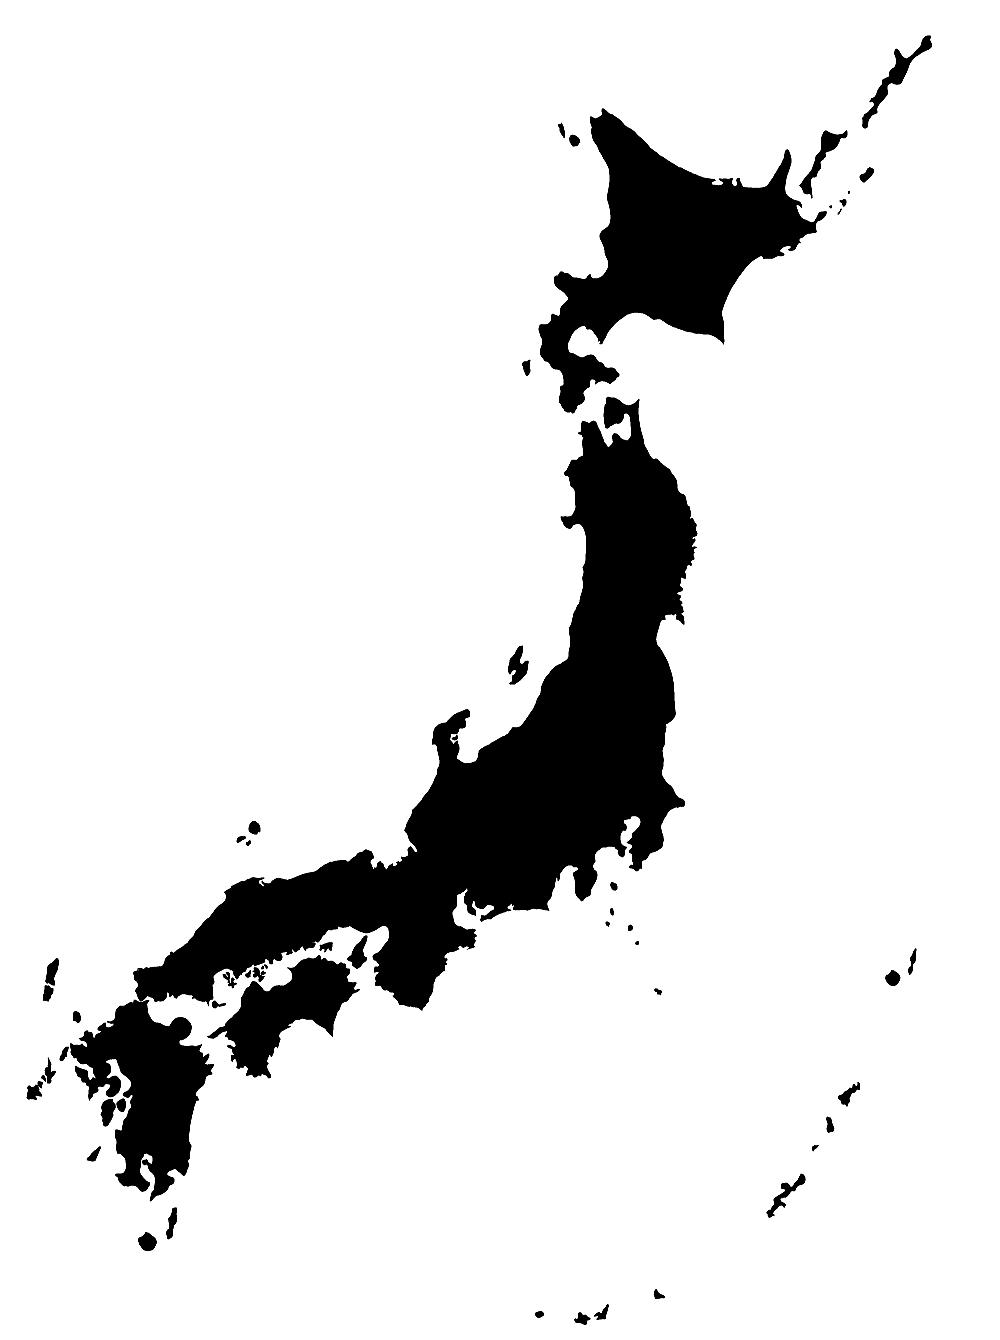 Japan Map Png - Japan map png